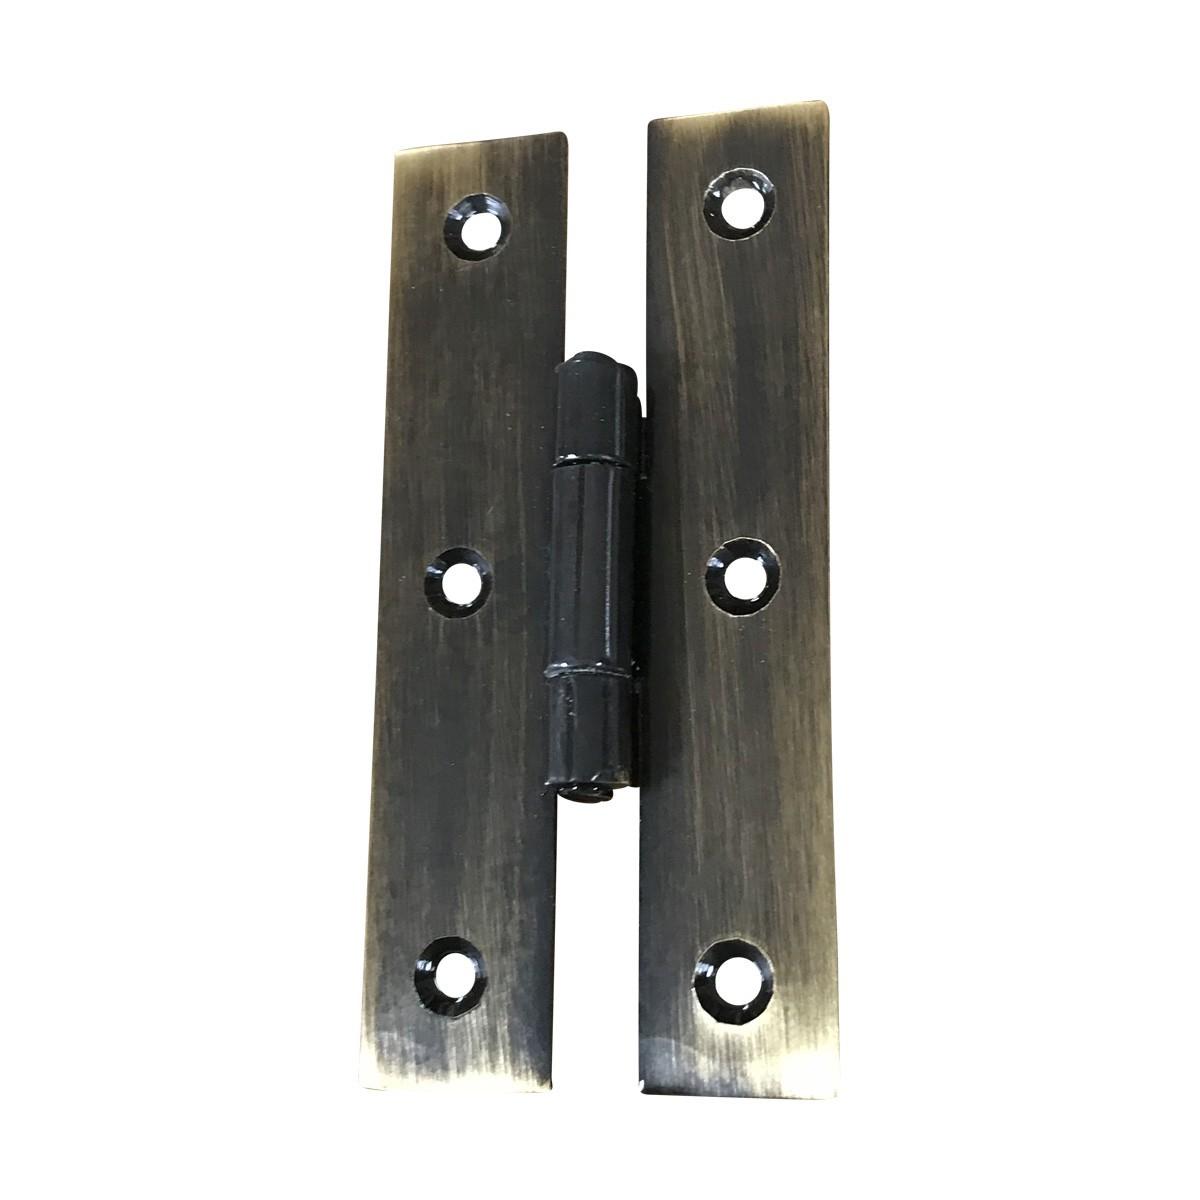 Bronze Cabinet Hinges H Hinges For Cabinets Bronze Door Hinges